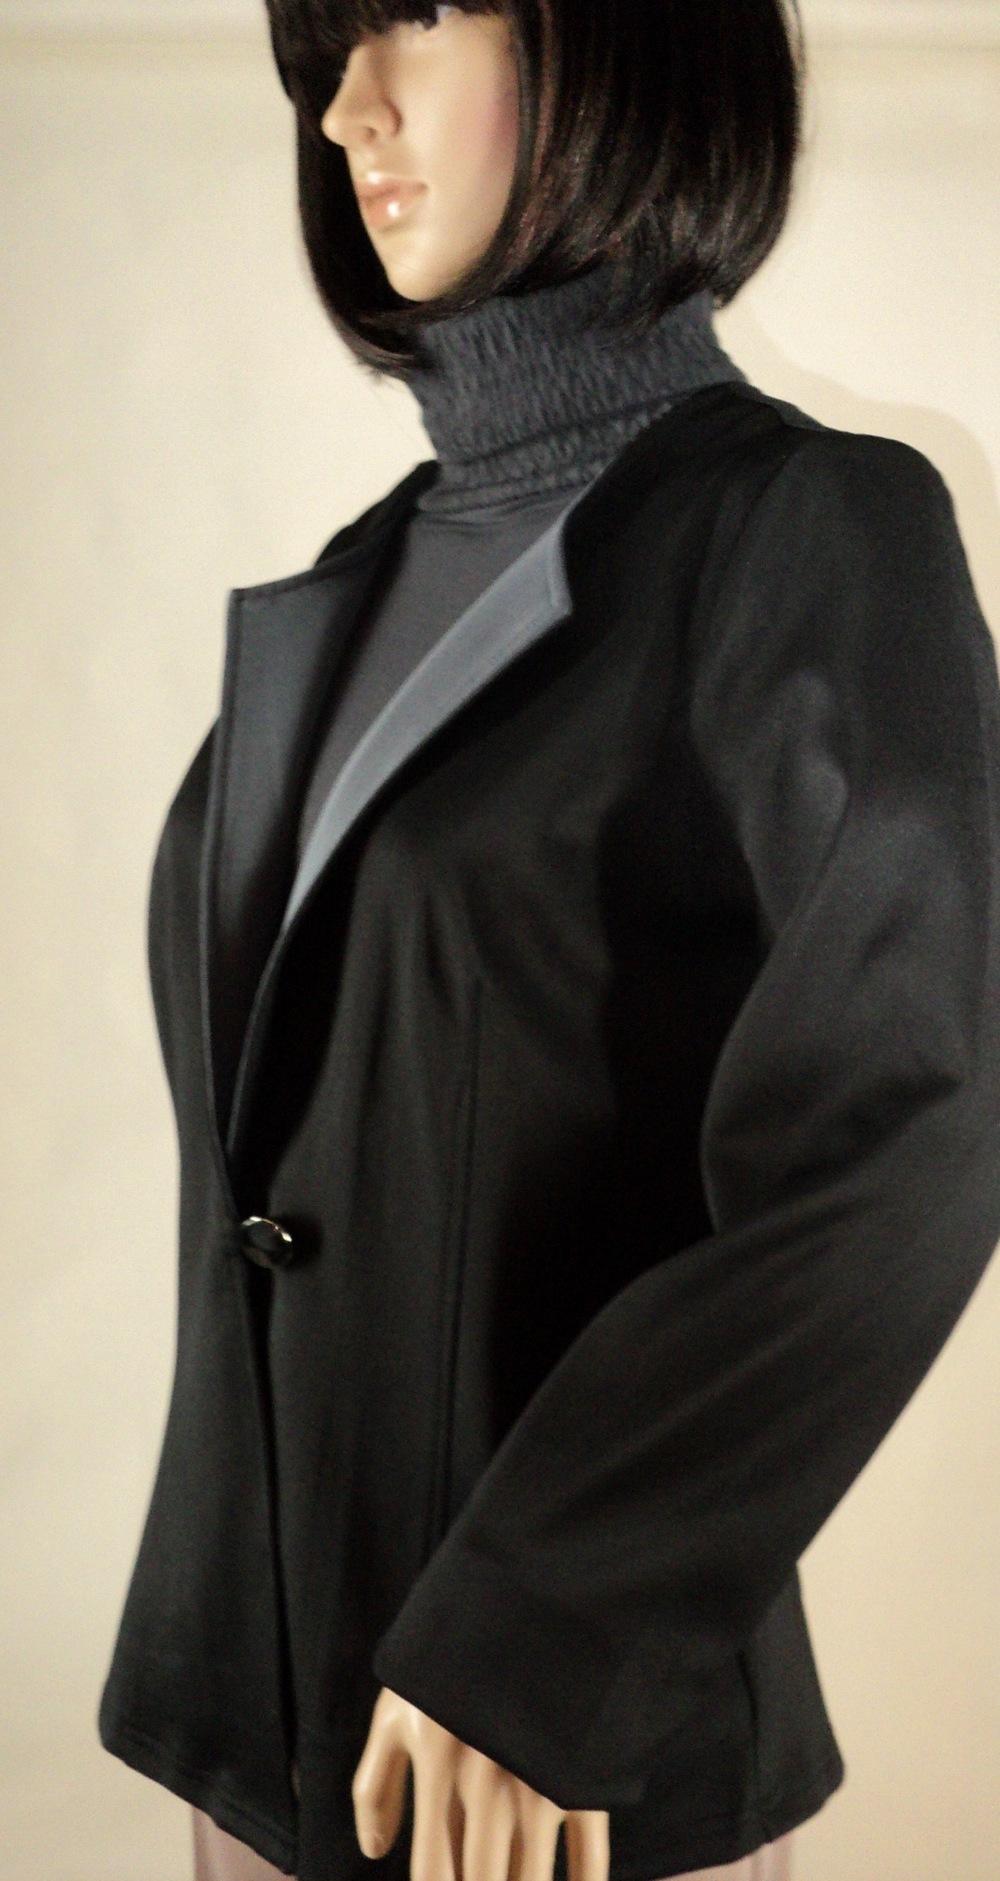 Black and Gray One Button Blazer_Side.jpg